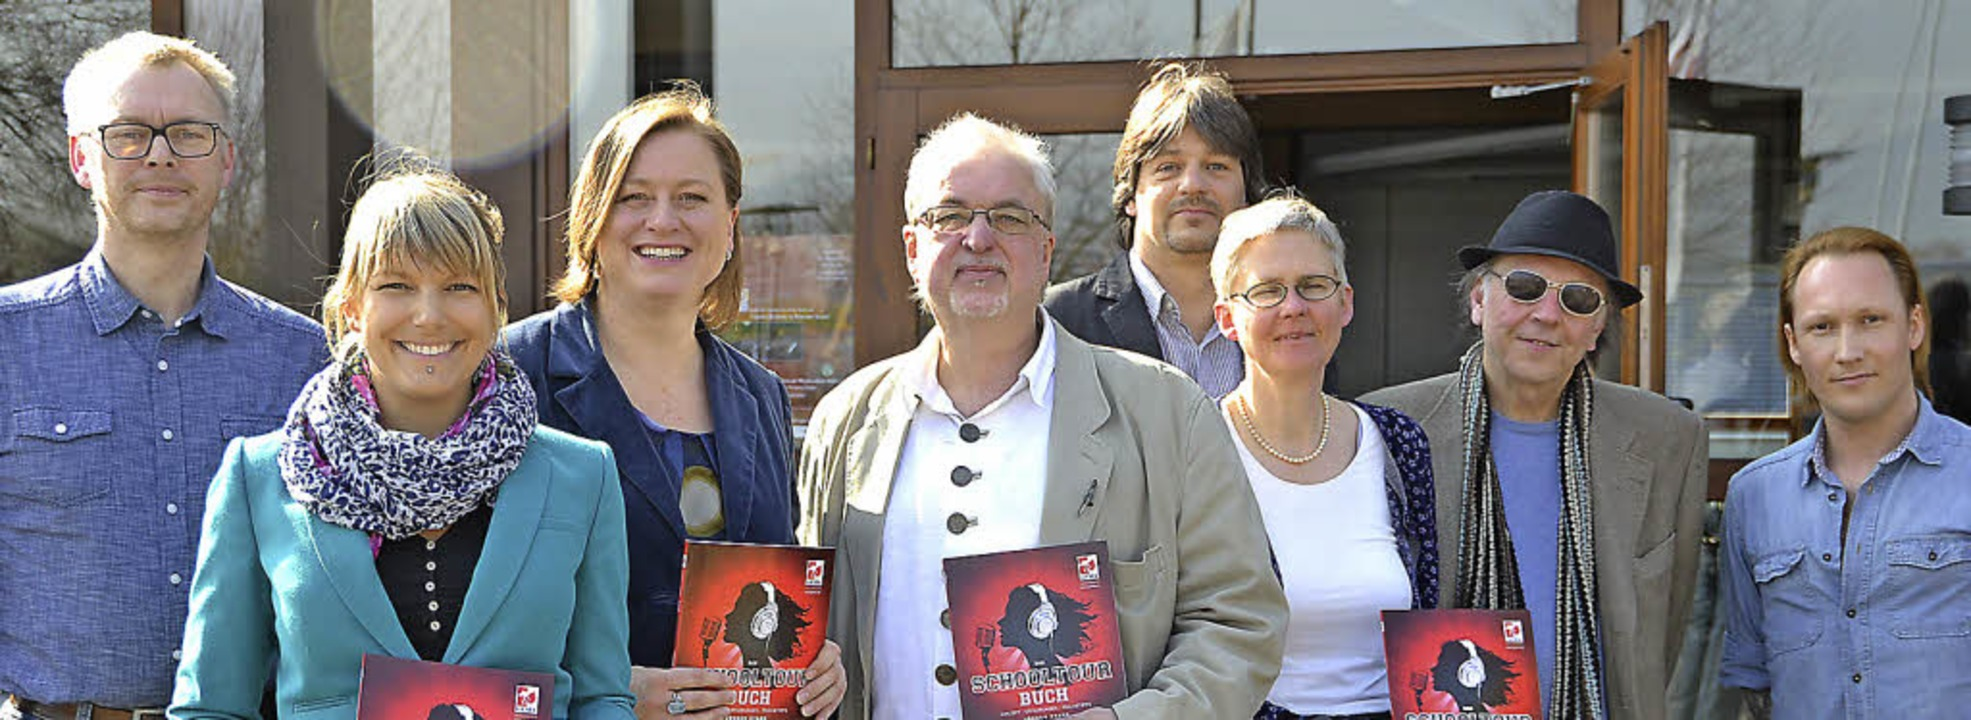 Gemeinsames Projekt (von links):  Mart...e Seidel (Popbüros Baden-Württemberg)   | Foto: lisa geppert